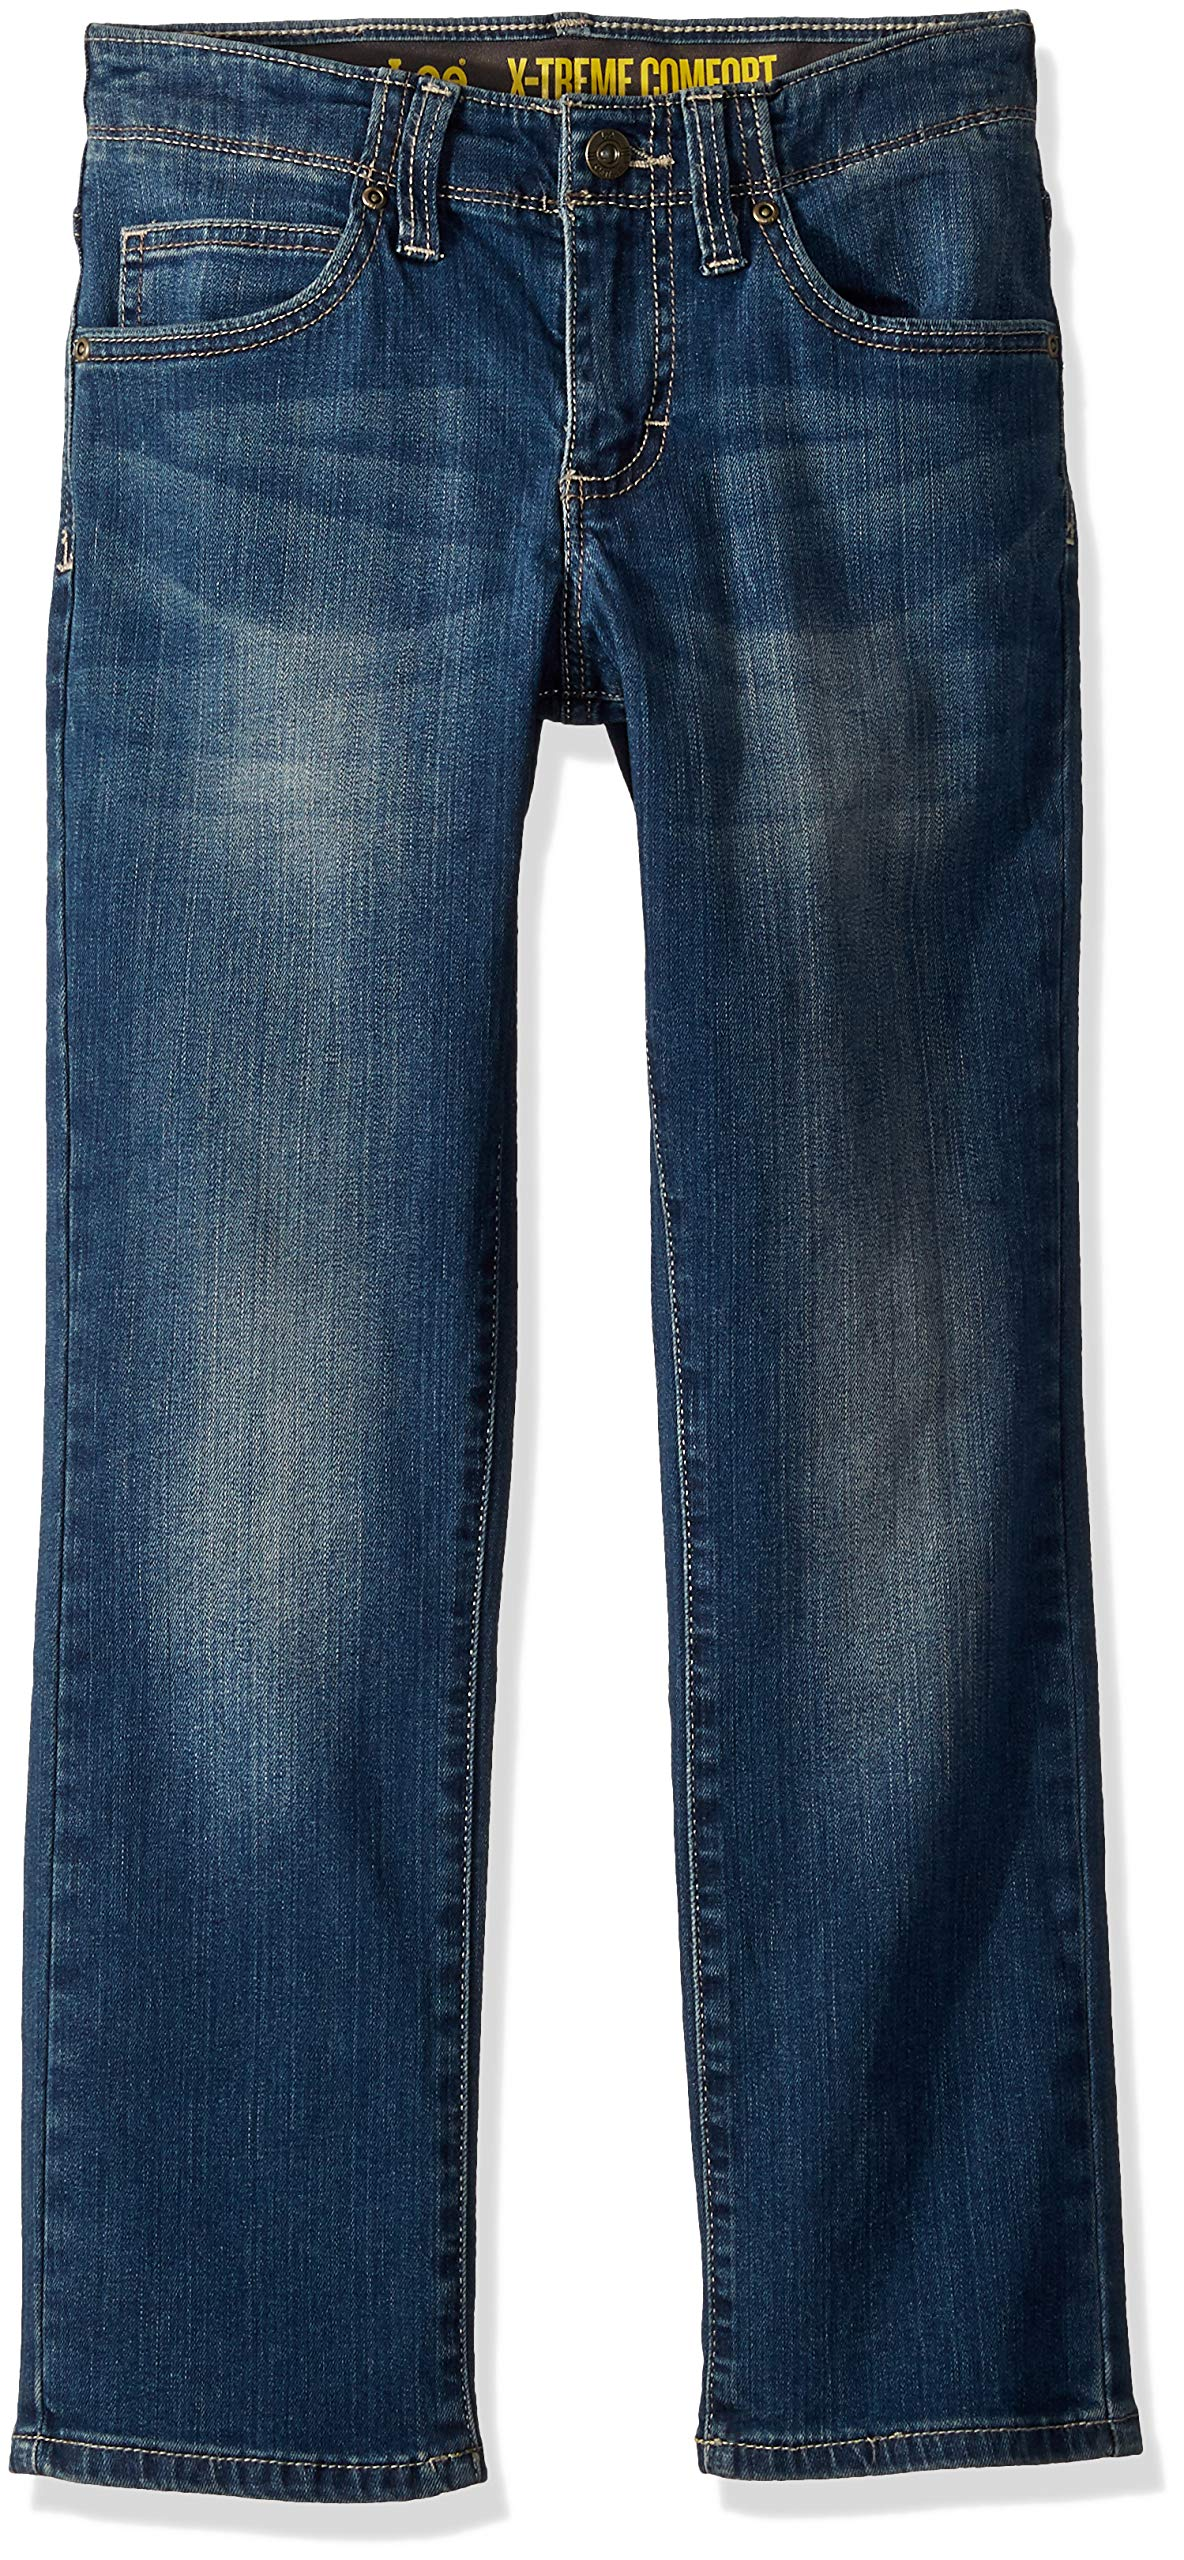 LEE Boys' Big Sport X-Treme Comfort Slim Jeans, Caspian, 18 Regular